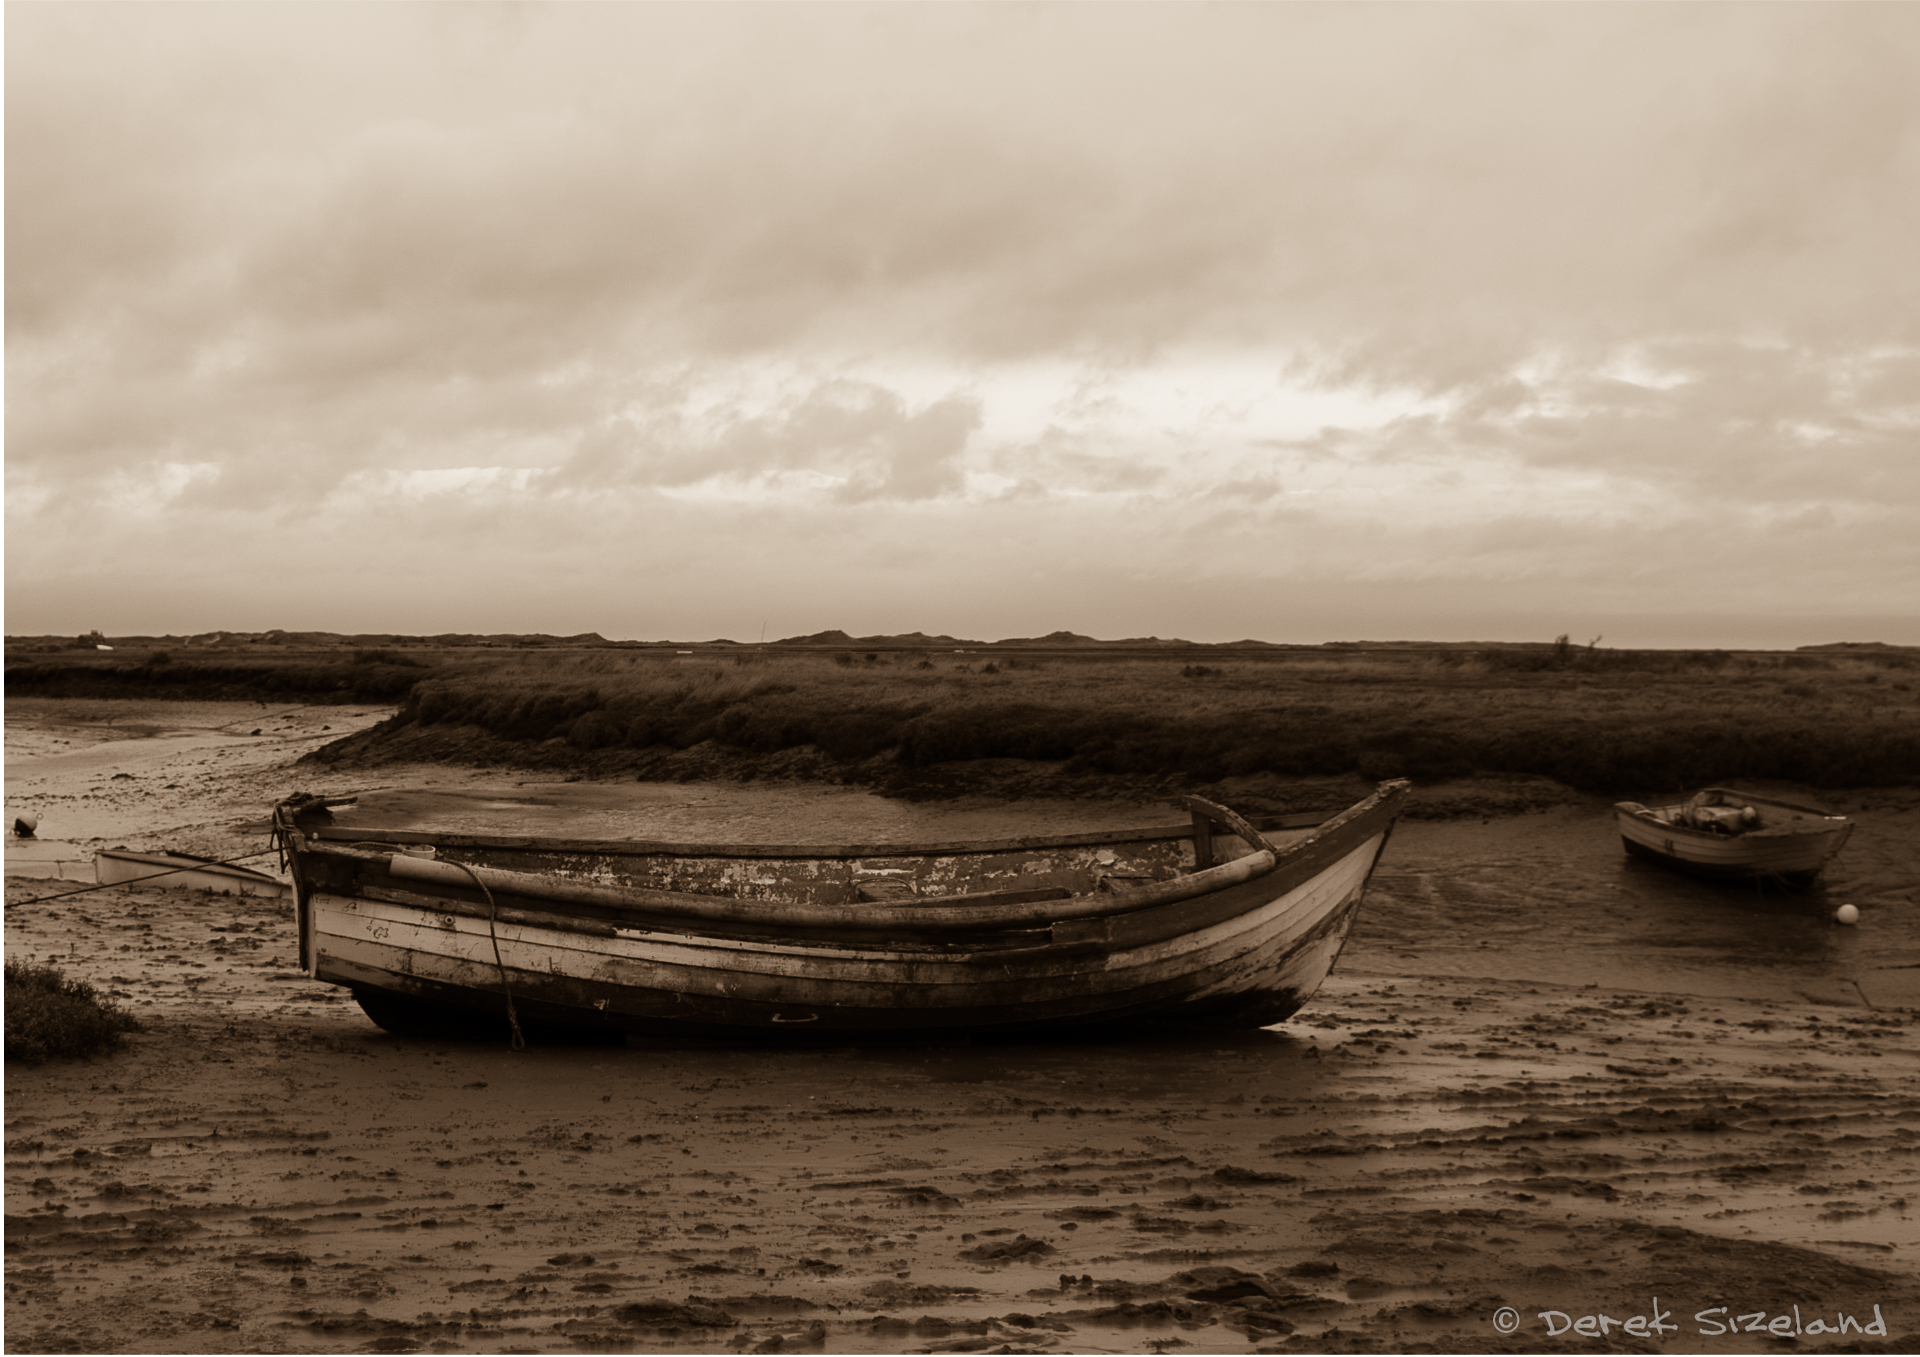 Boat_edited.jpg